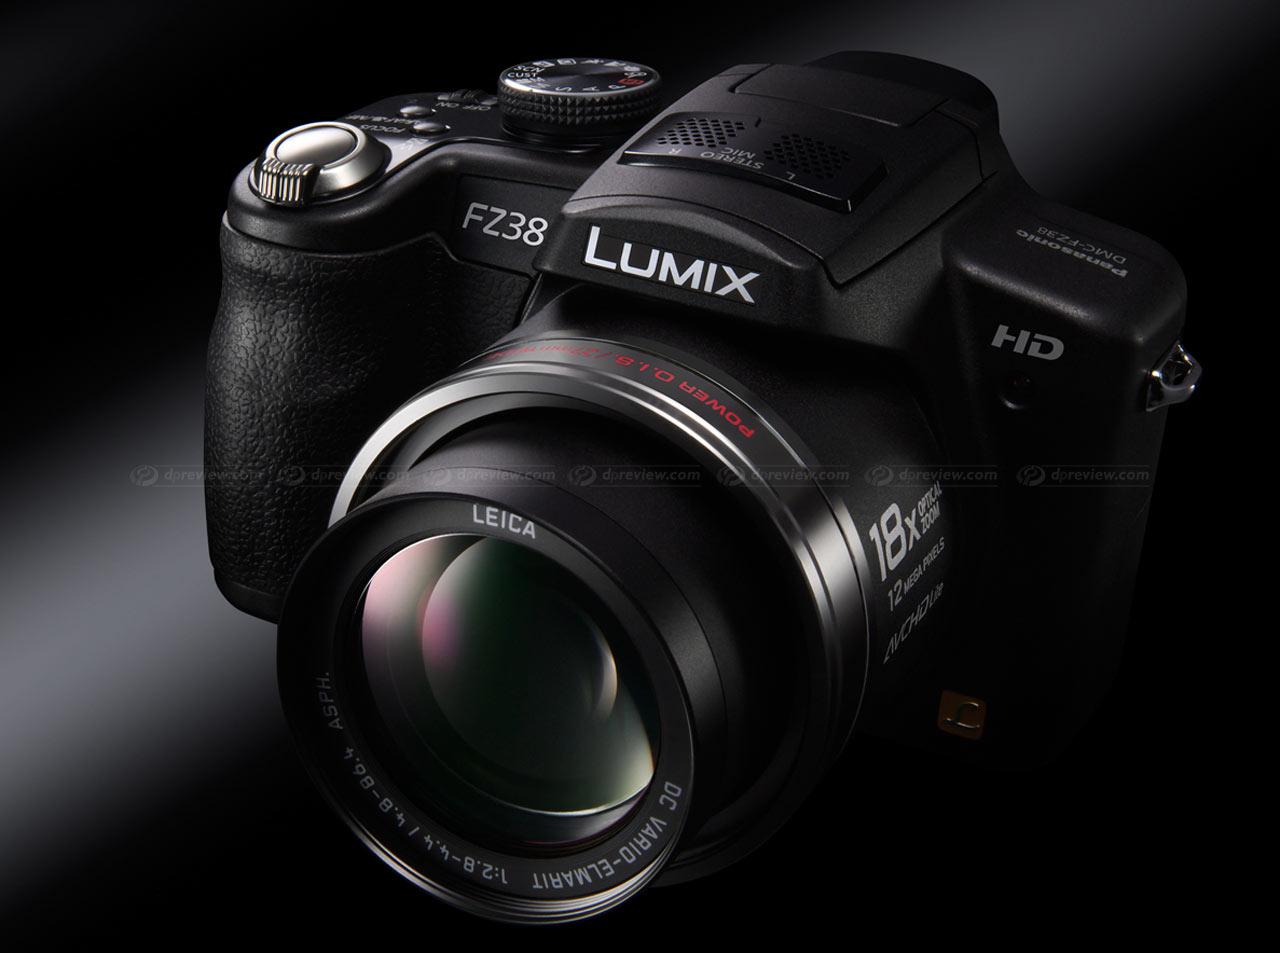 panasonic unveils lumix dmc fz35 fz38 super zoom digital rh dpreview com panasonic dmc fz38 user manual Panasonic Technical Support